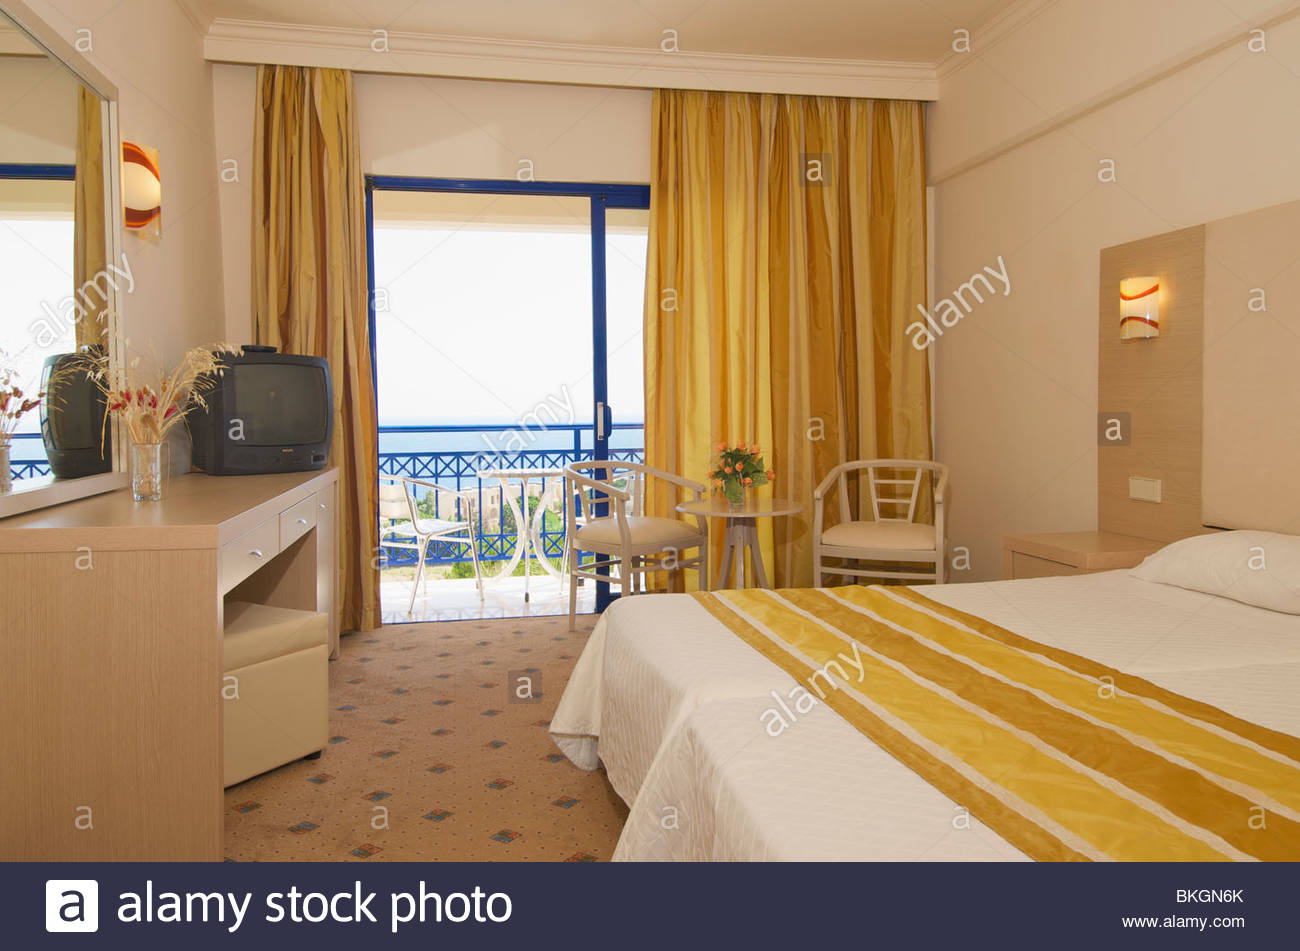 Kresten Palace 4 (Greece. RhodesKalithea): photos, room description, features of the service and reviews 85